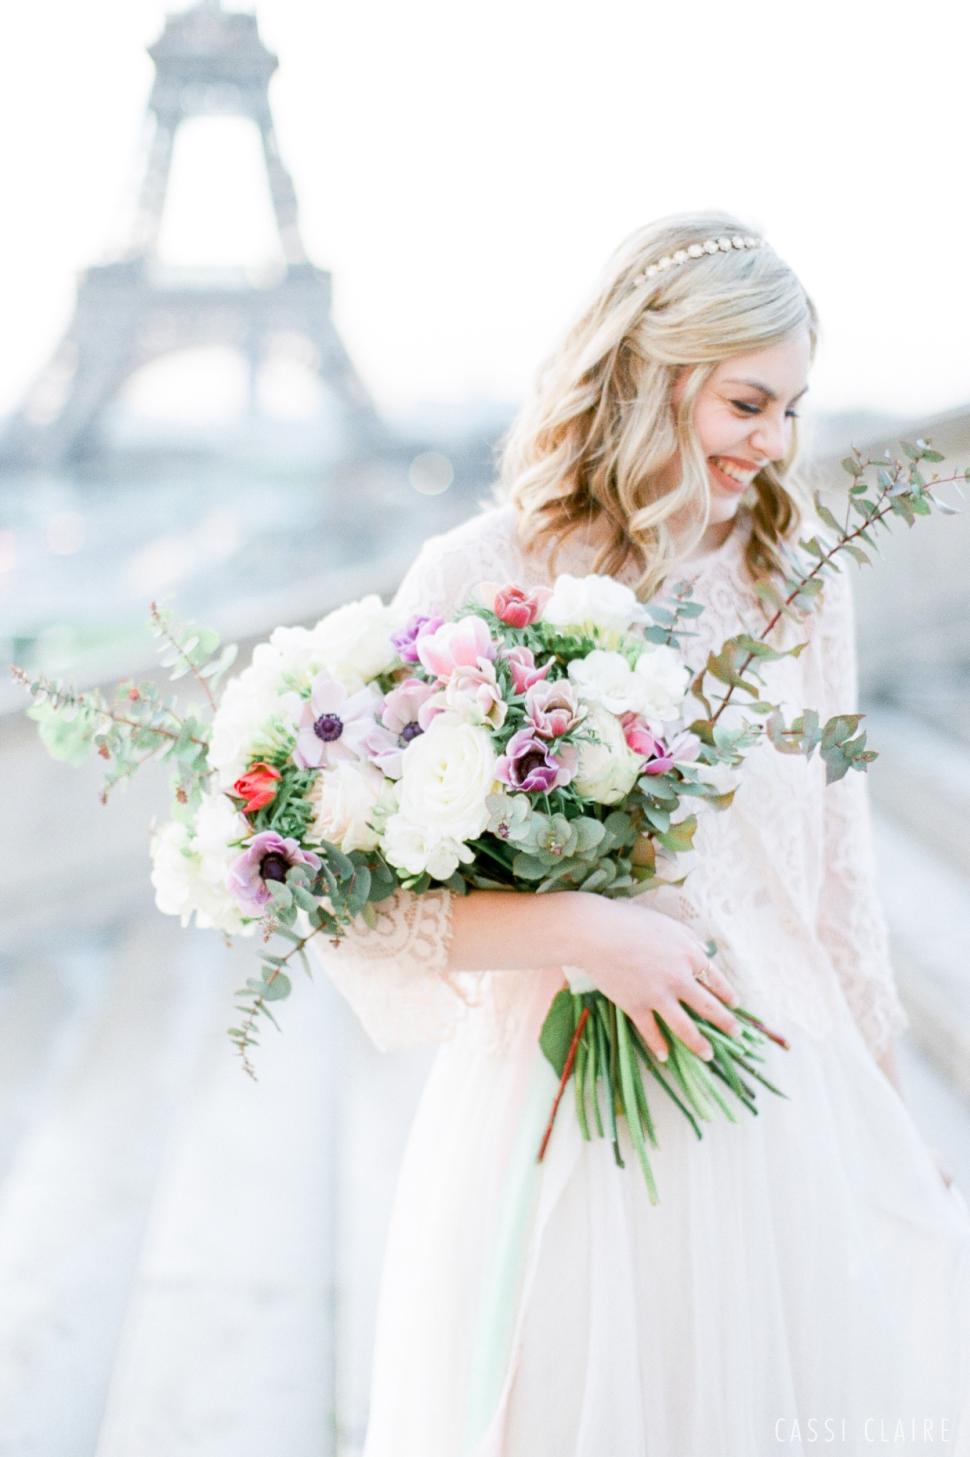 Paris-France-Wedding_CassiClaire_02.jpg